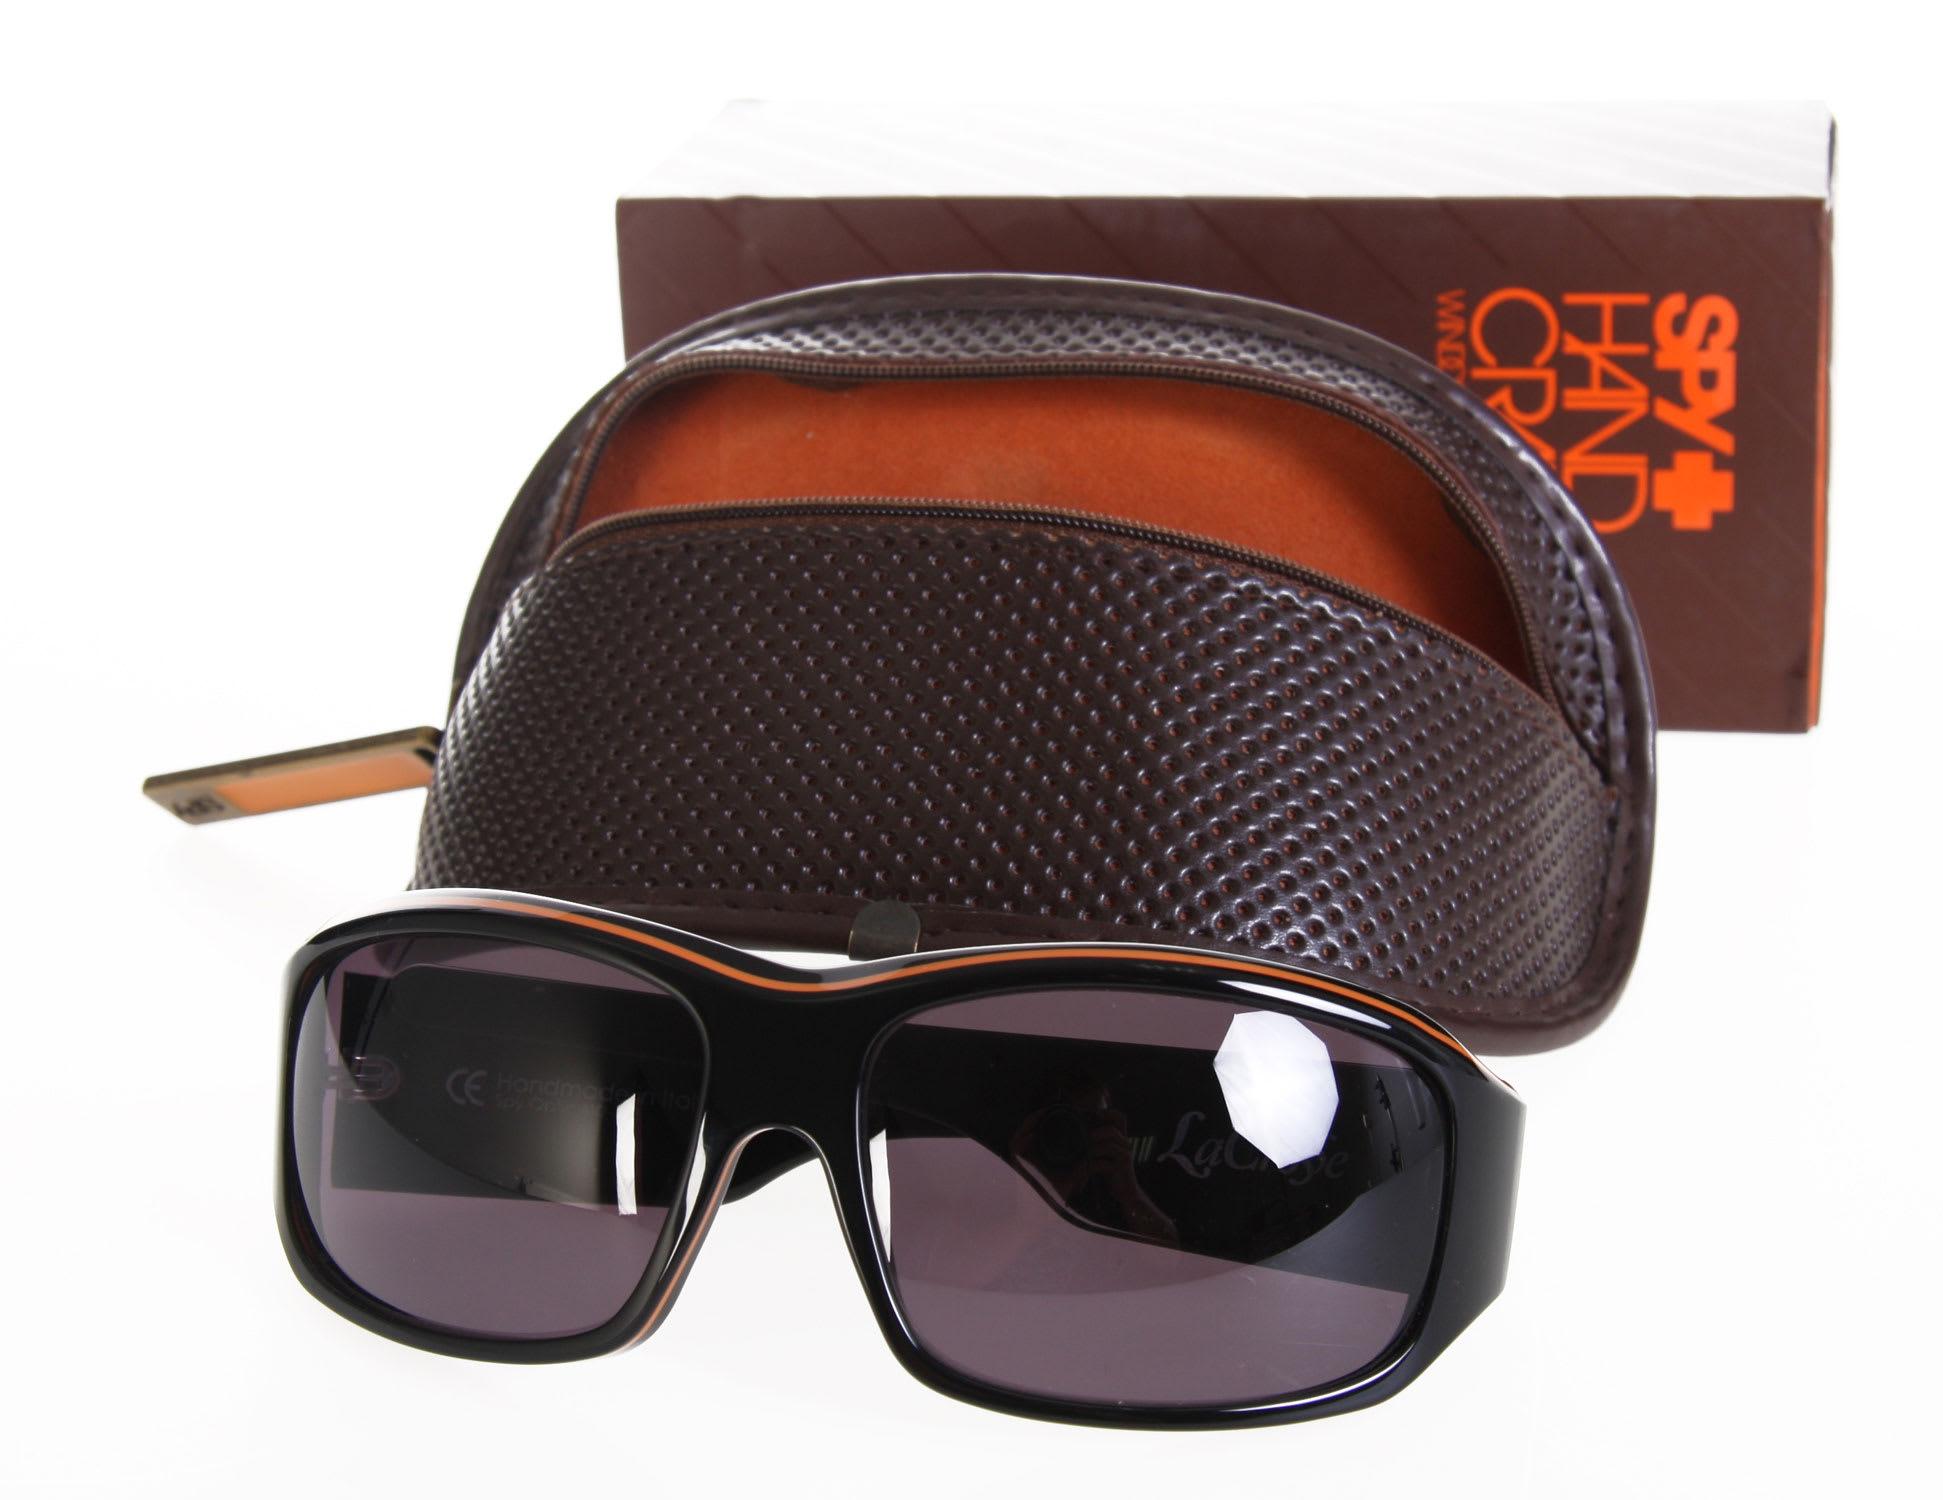 7ee96788c1 Spy Lacrosse Sunglasses Black Orange Pinstripe Grey Lens on PopScreen